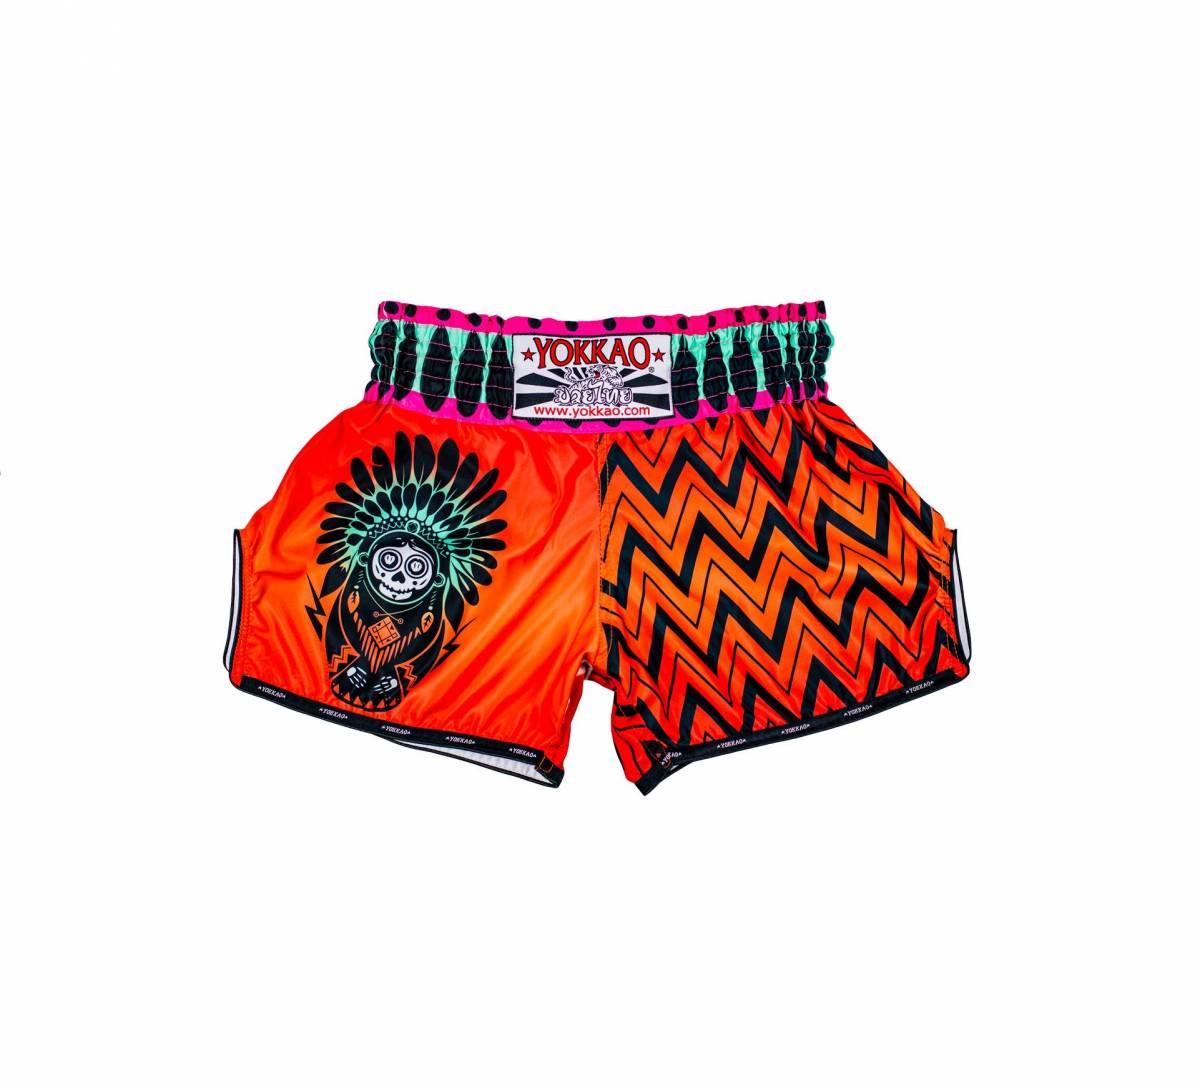 yokkao shorts carbonfit santa muerte